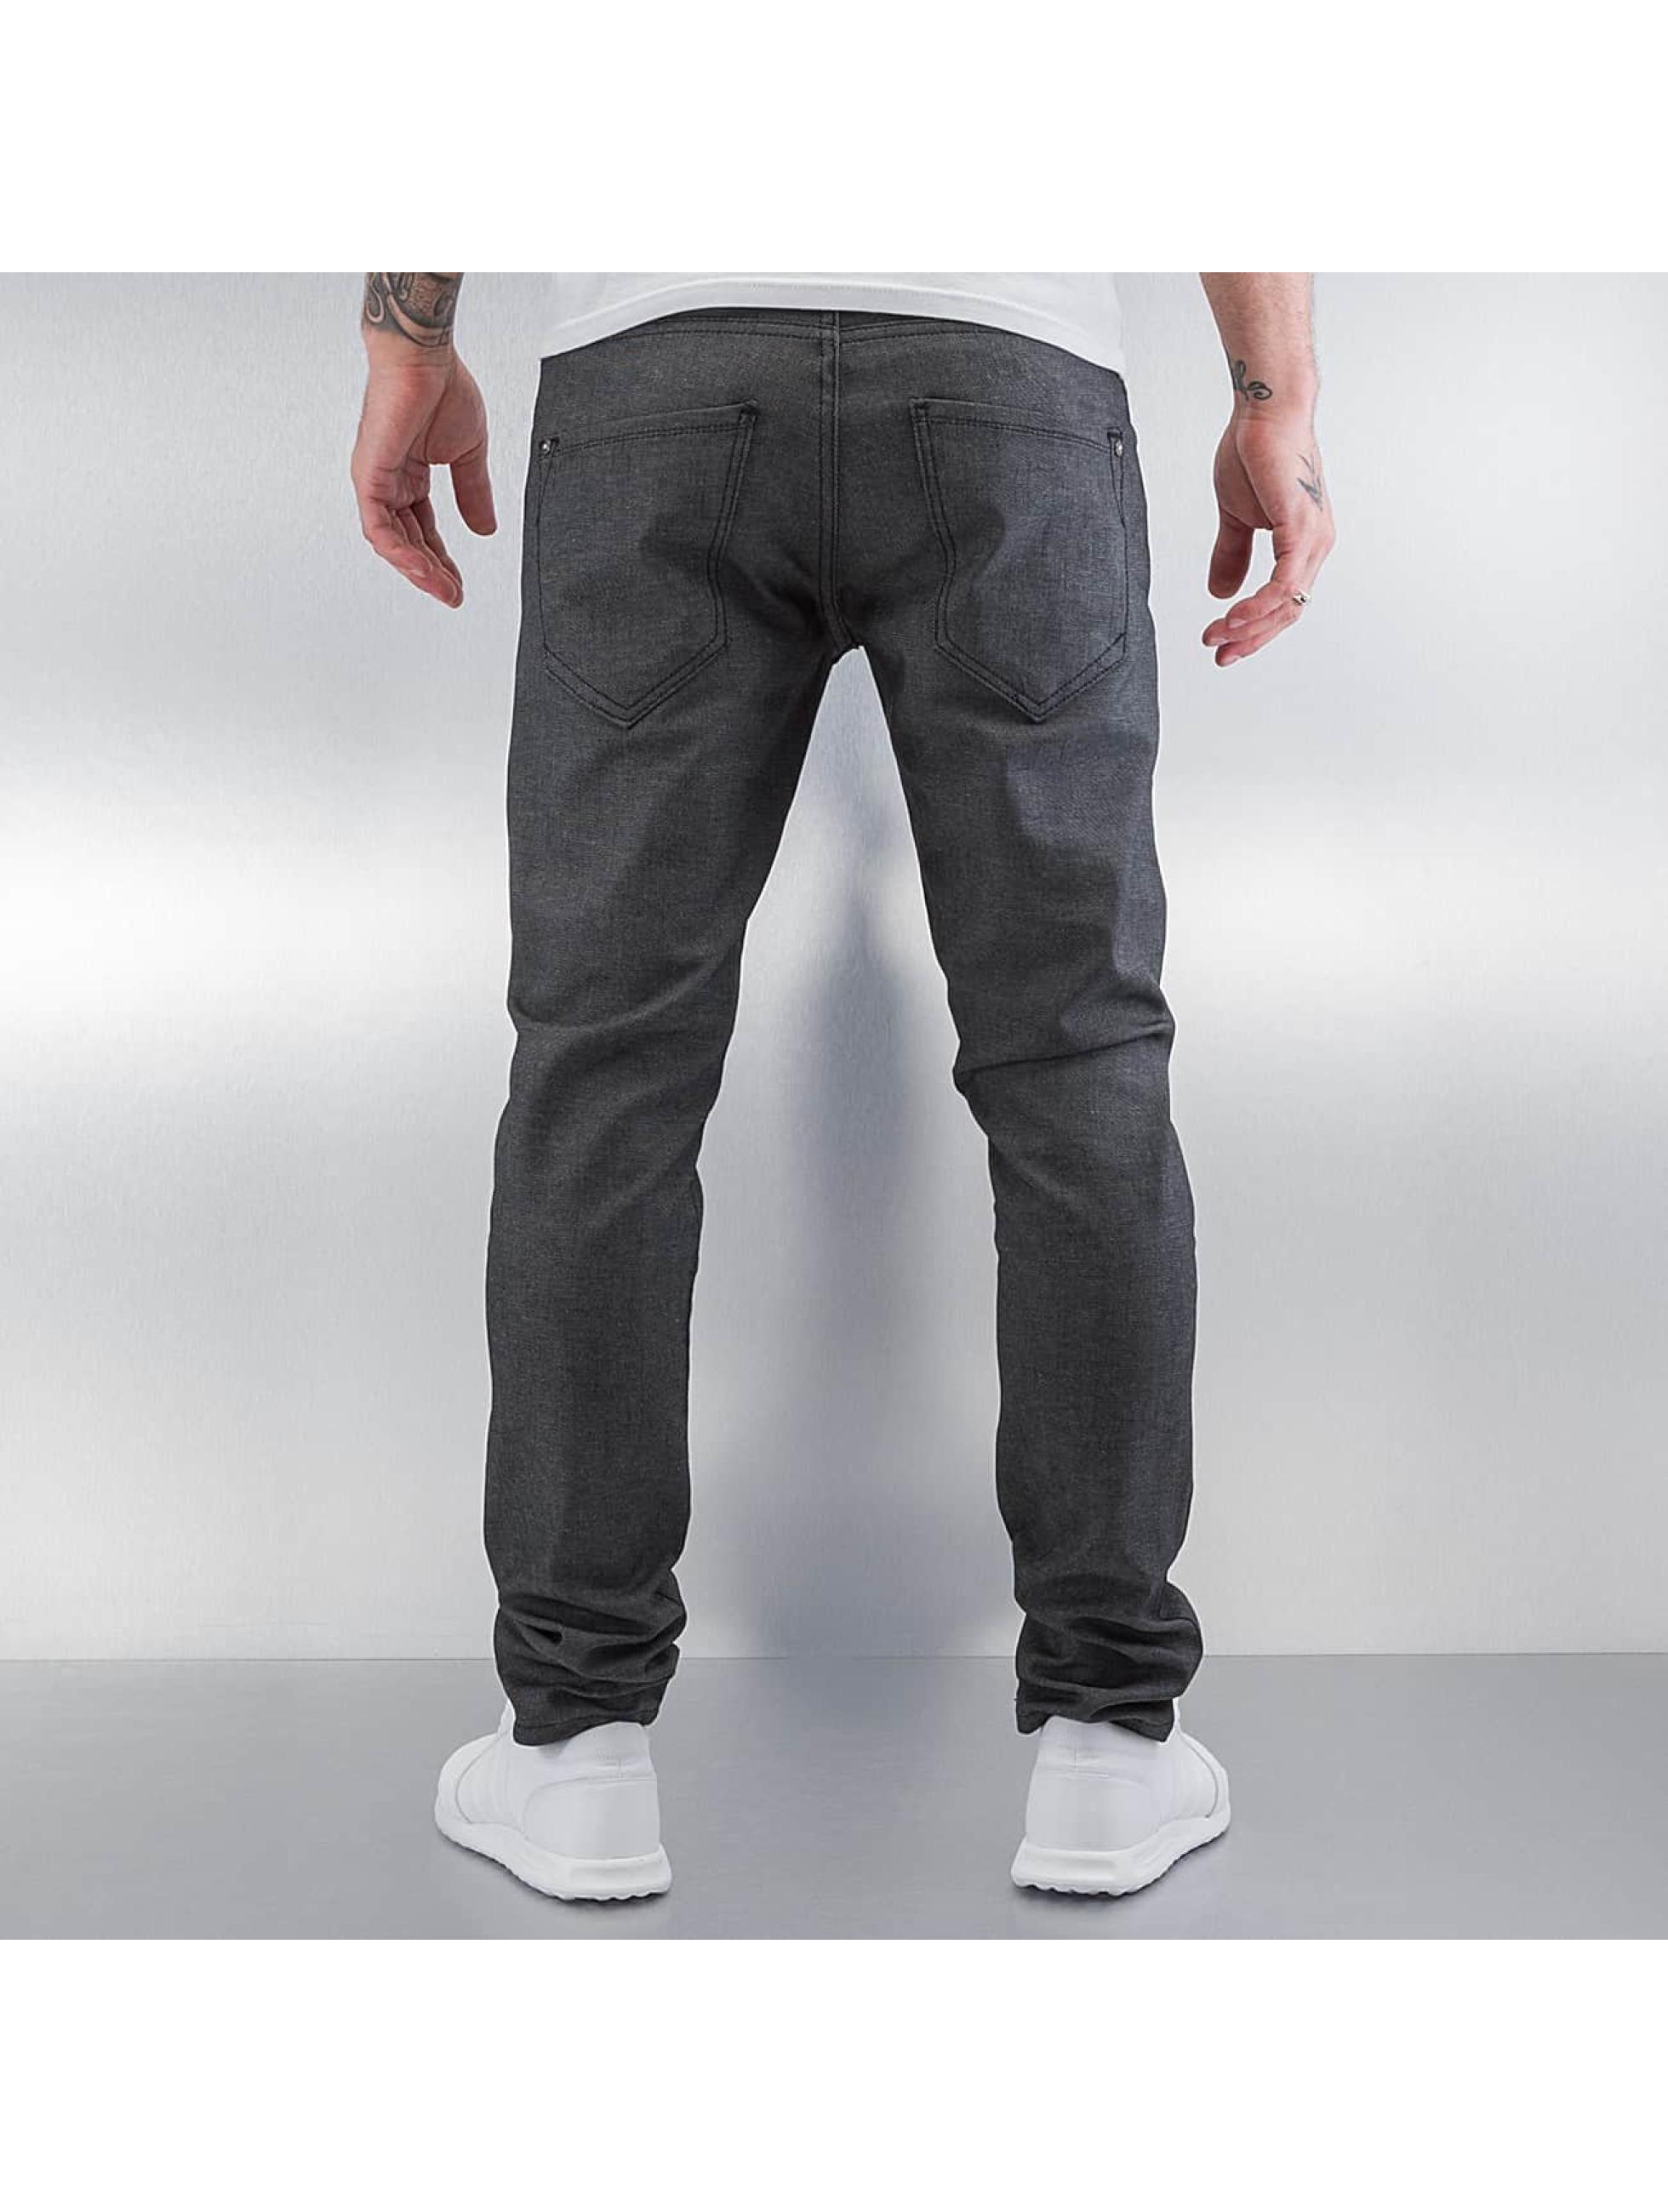 Pascucci Skinny Jeans SANTA grey